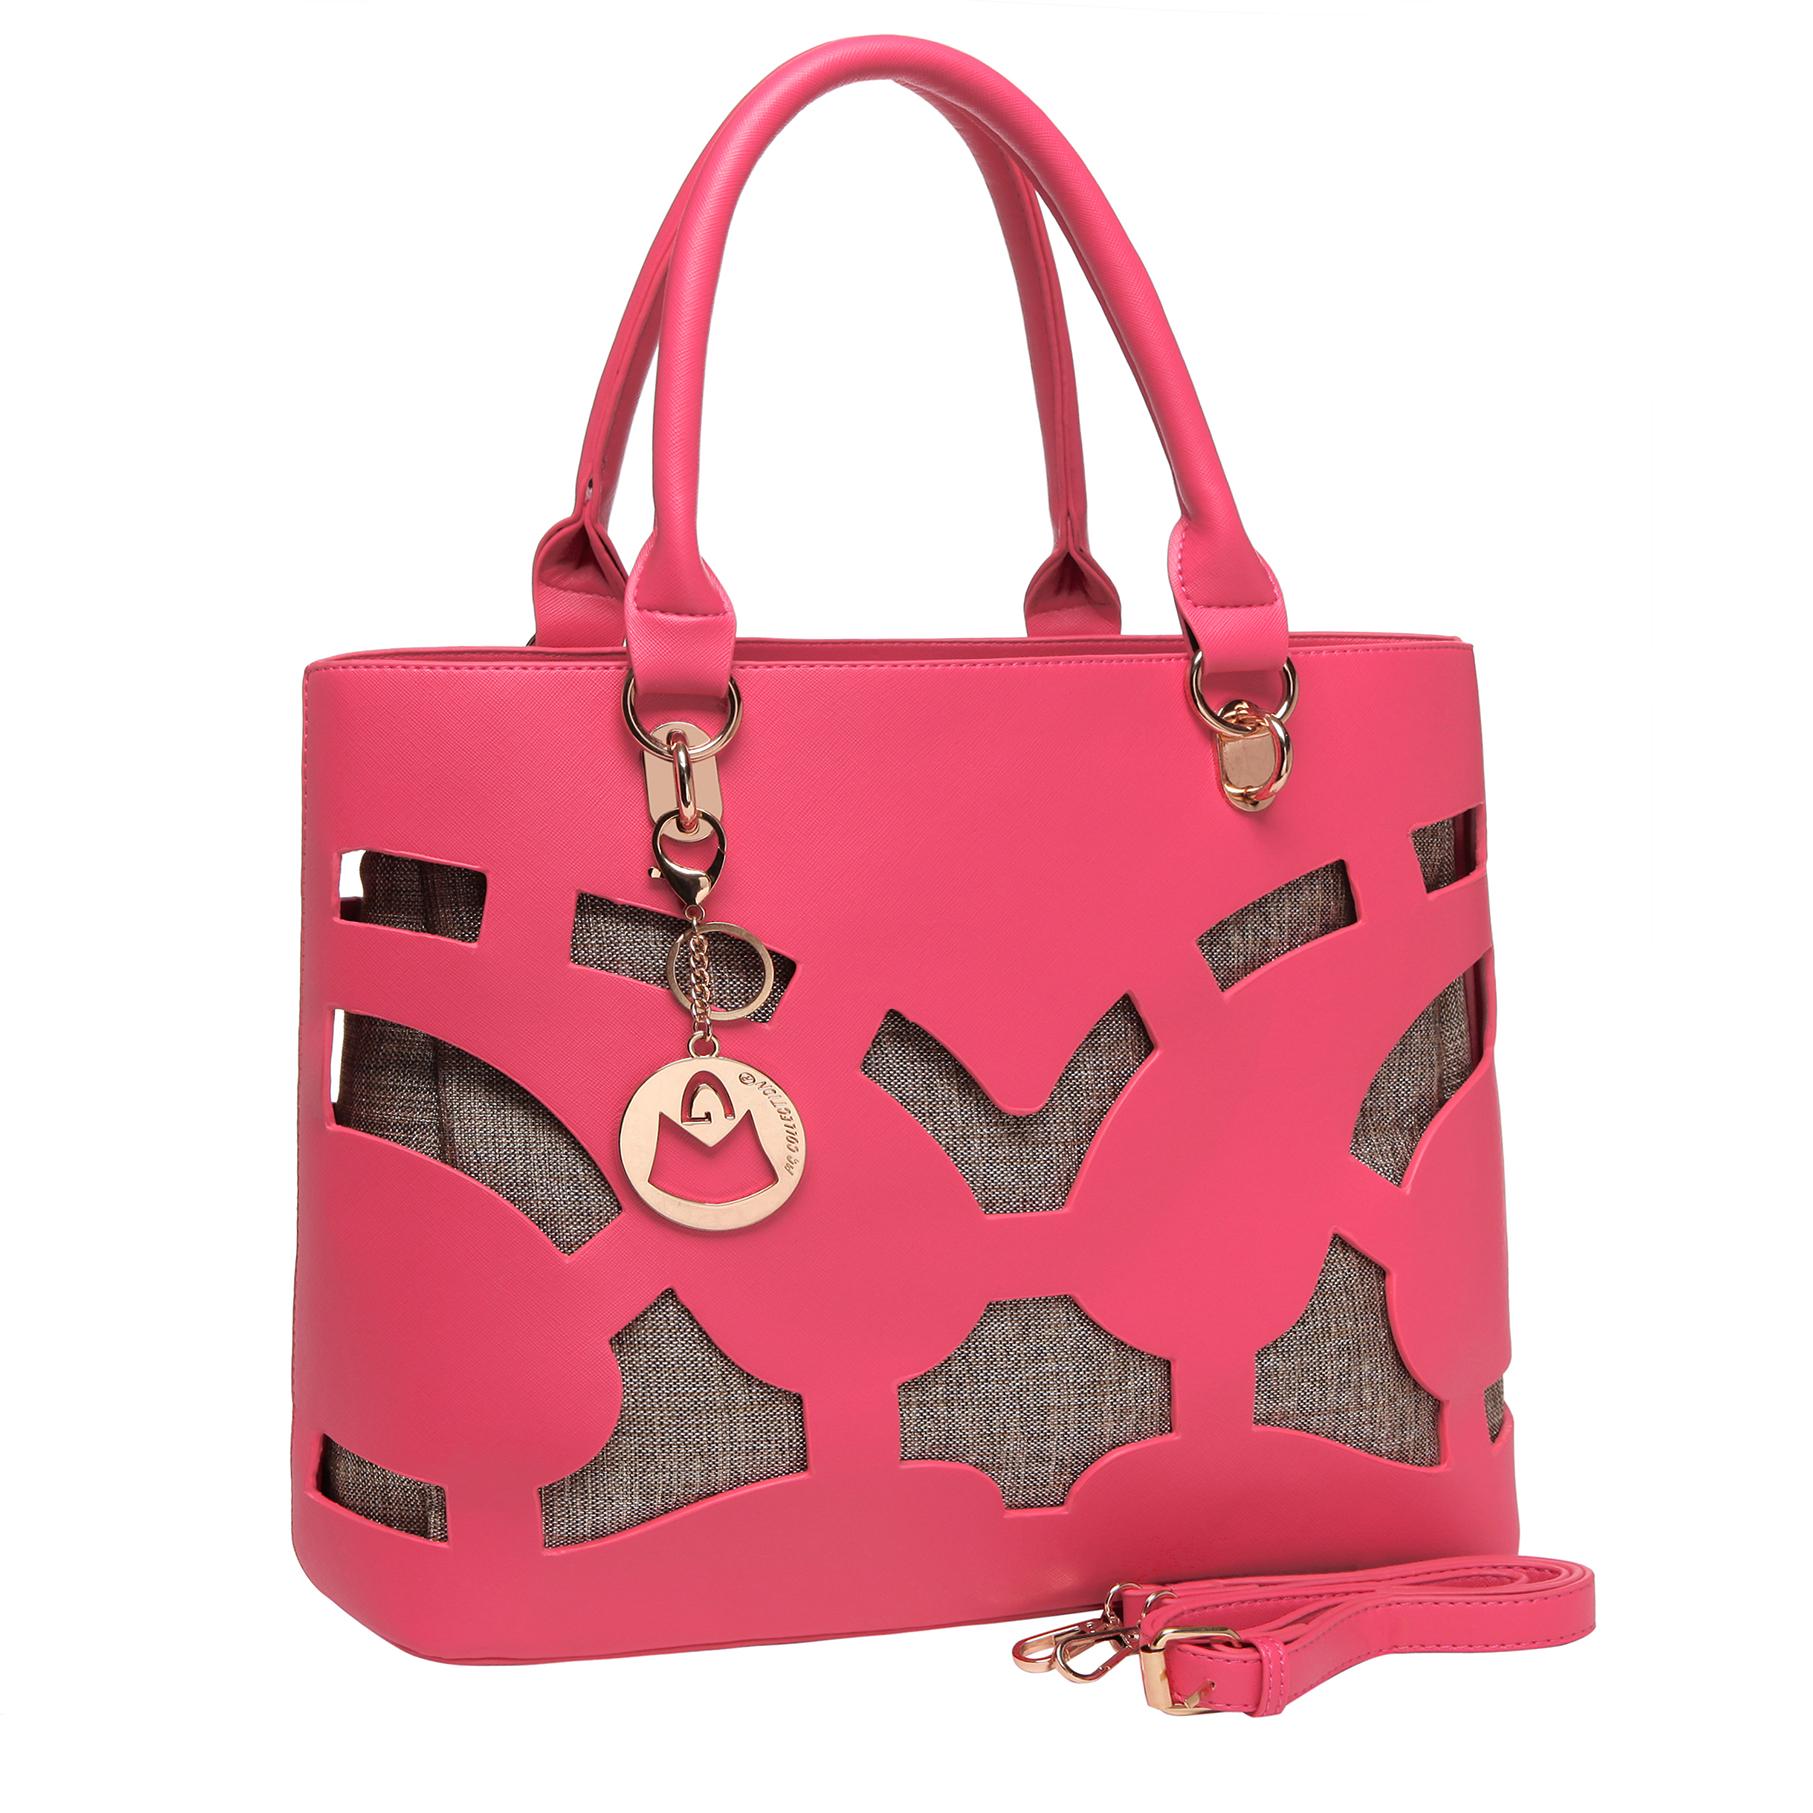 TAYLA Pink Fashion Tote main image